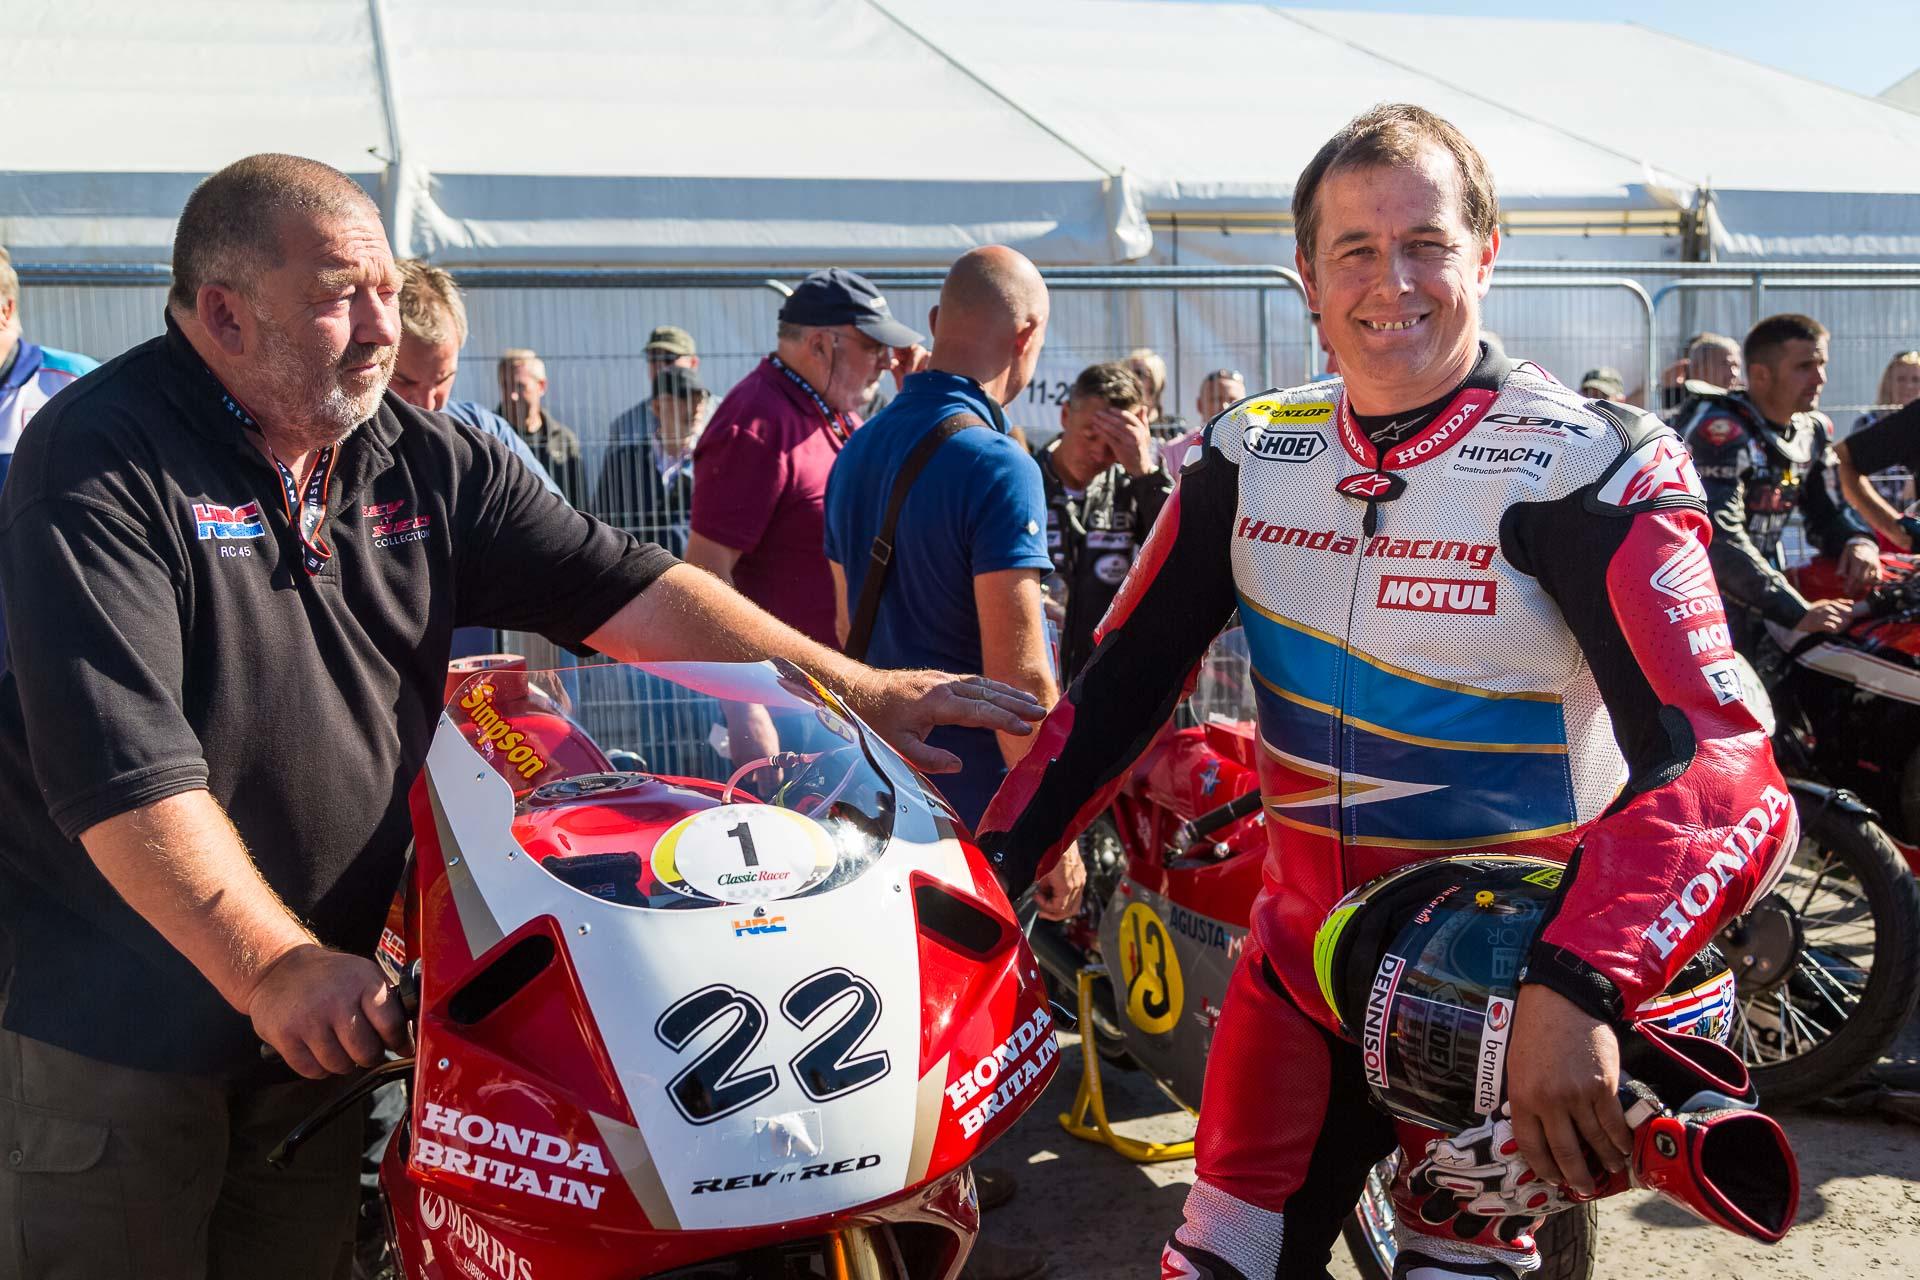 John McGuinness mit seiner Honda RC45. Foto: Krause/MotorPhoto.de